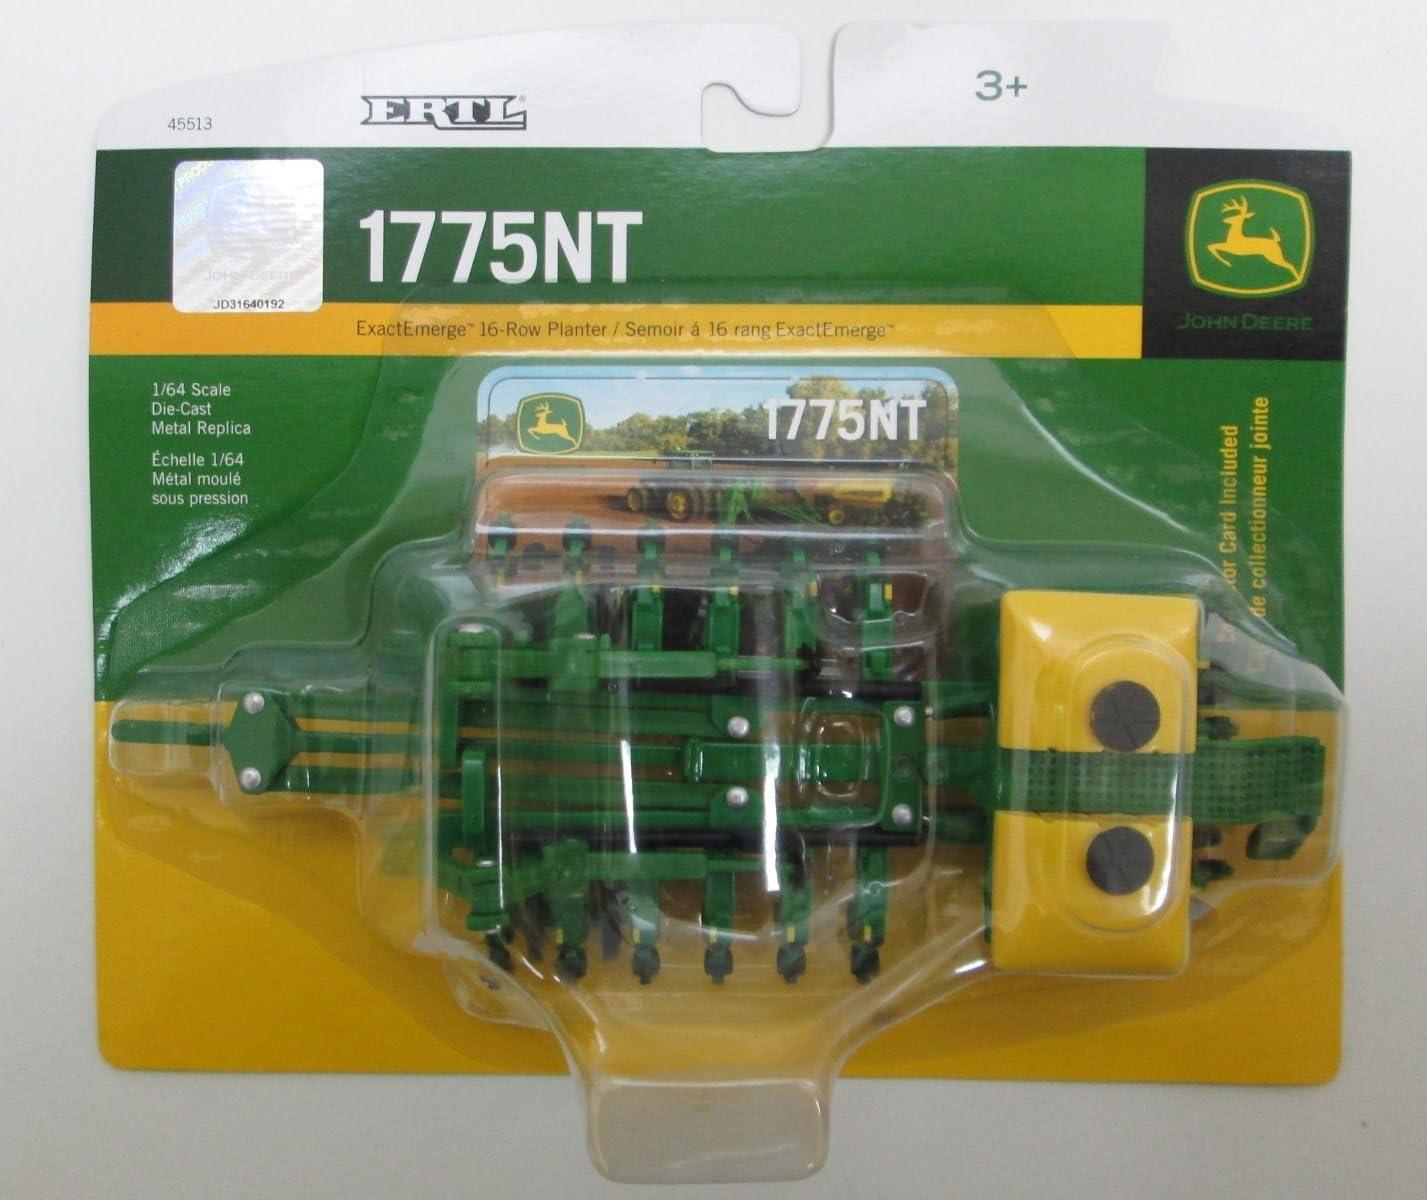 1/64 John Deere 1775NT Planter Toy by Ertl #45513 - LP53304